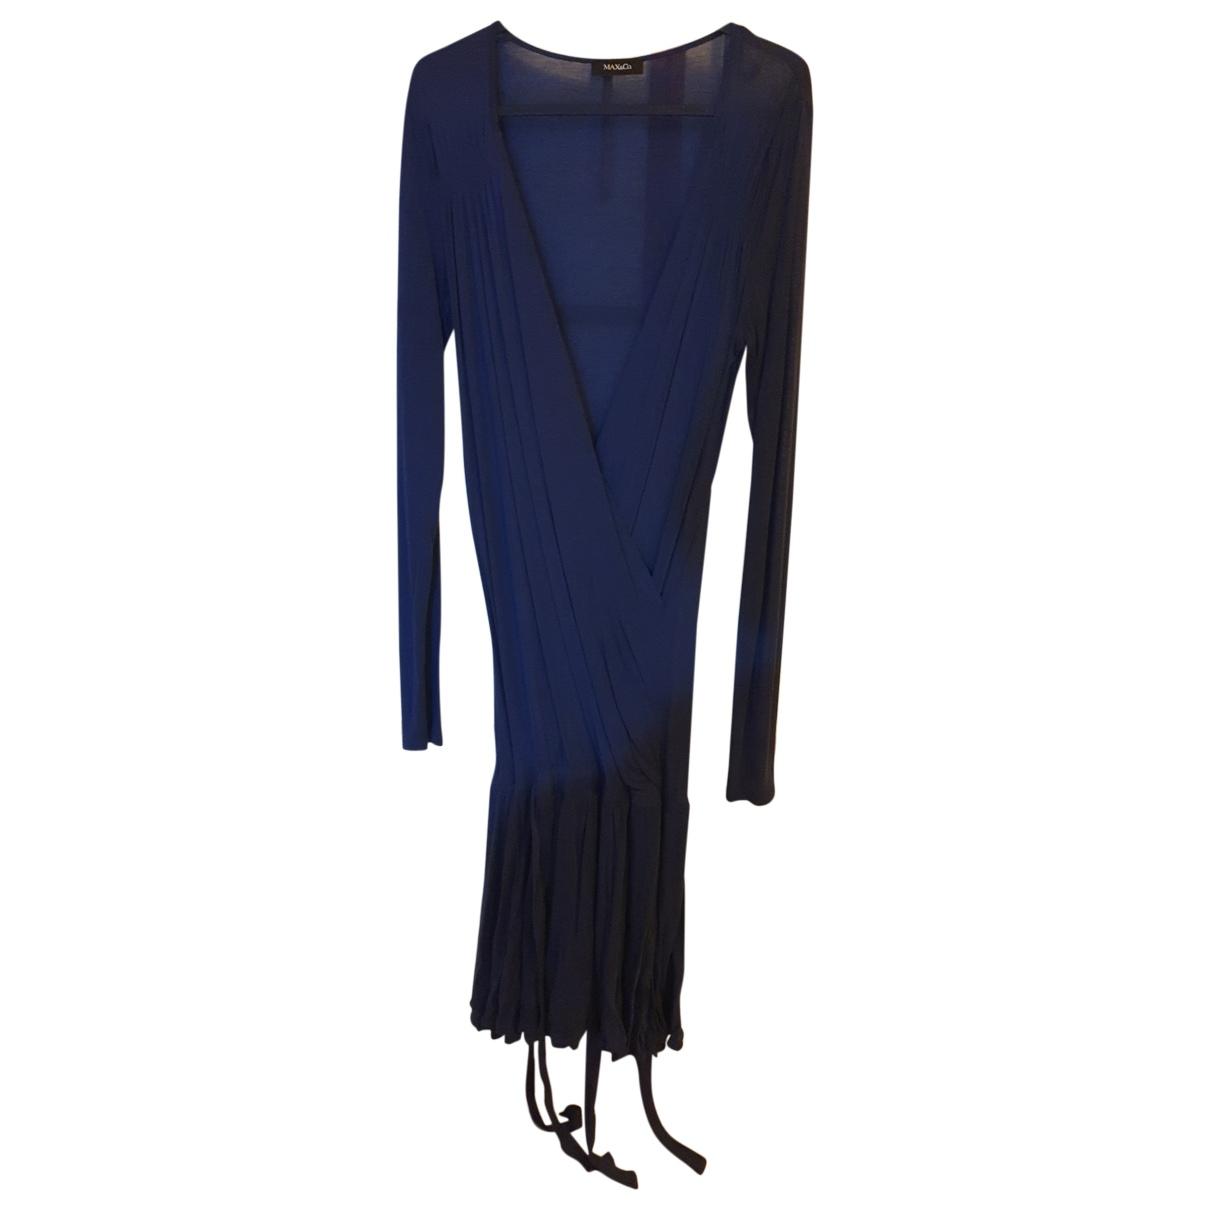 Max & Co N Blue Cotton dress for Women M International